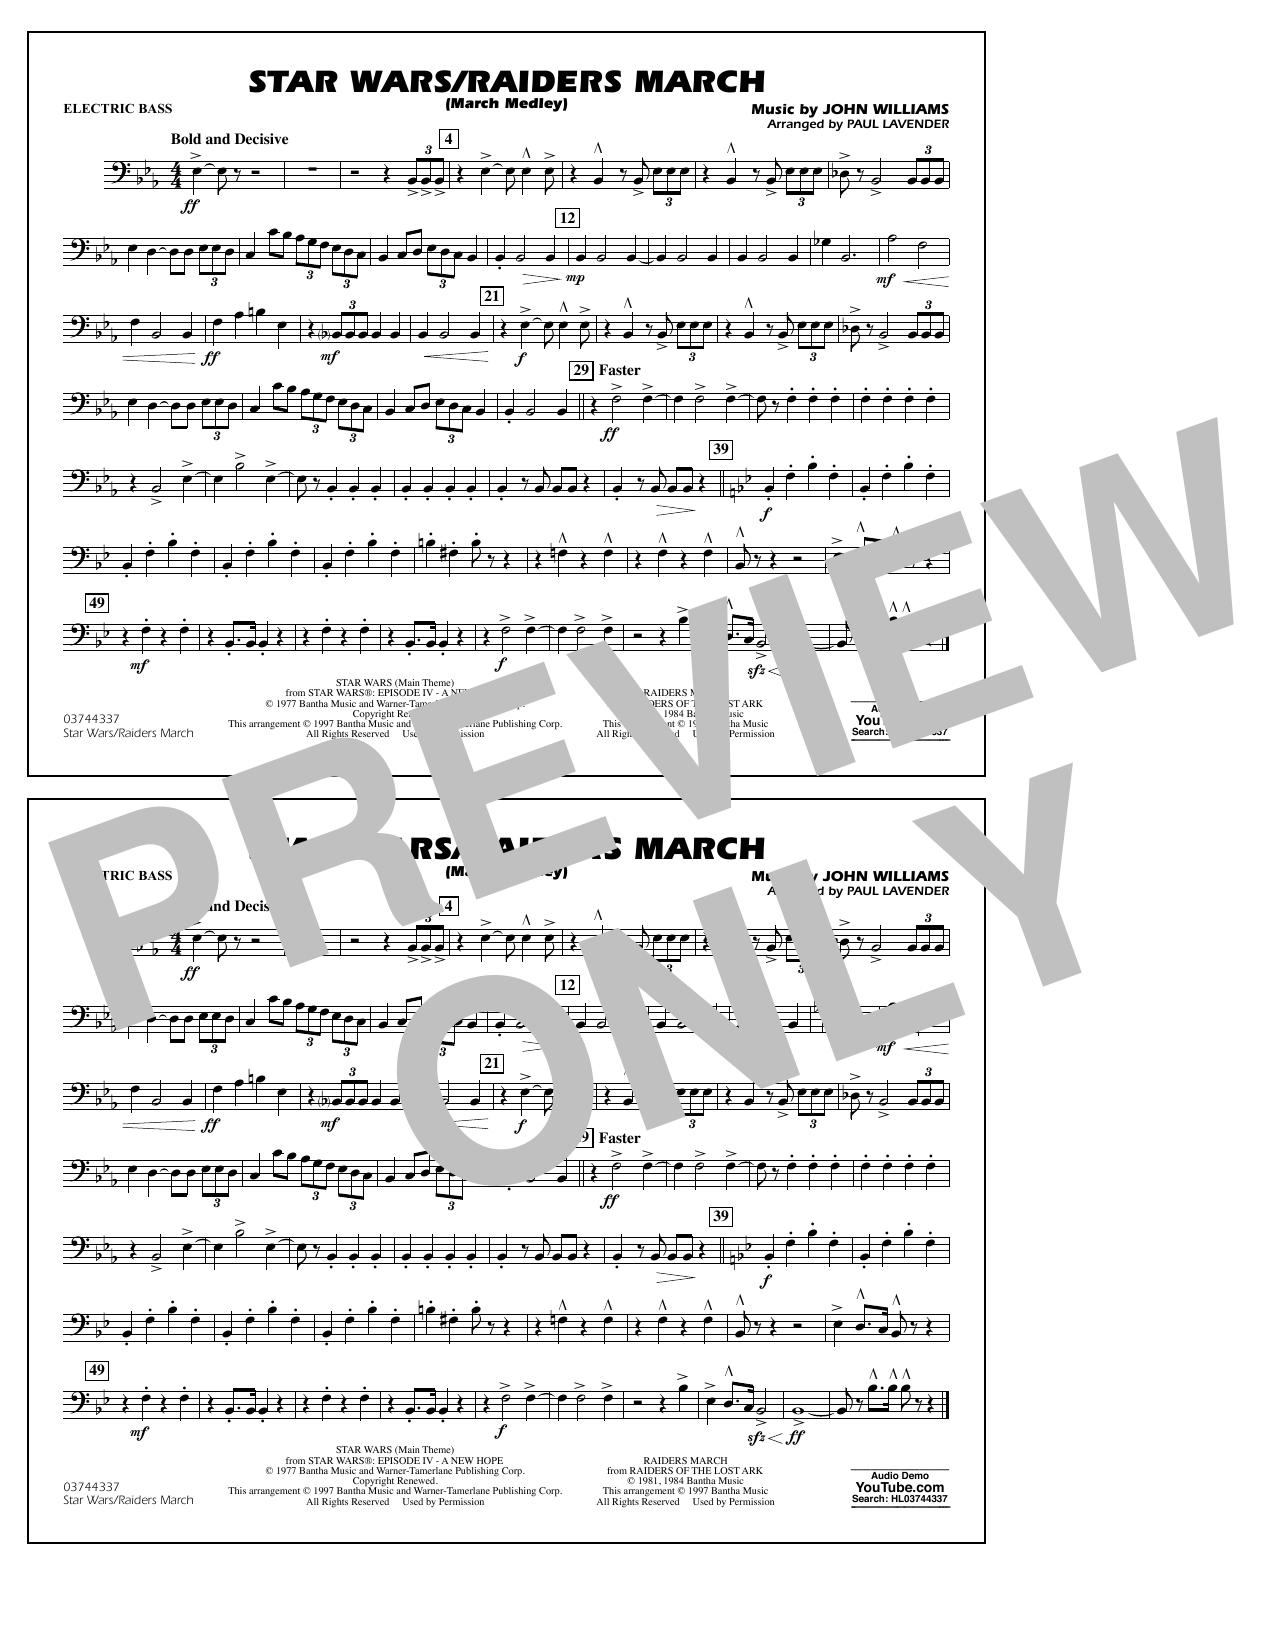 Star Wars/Raiders March - Electric Bass Sheet Music